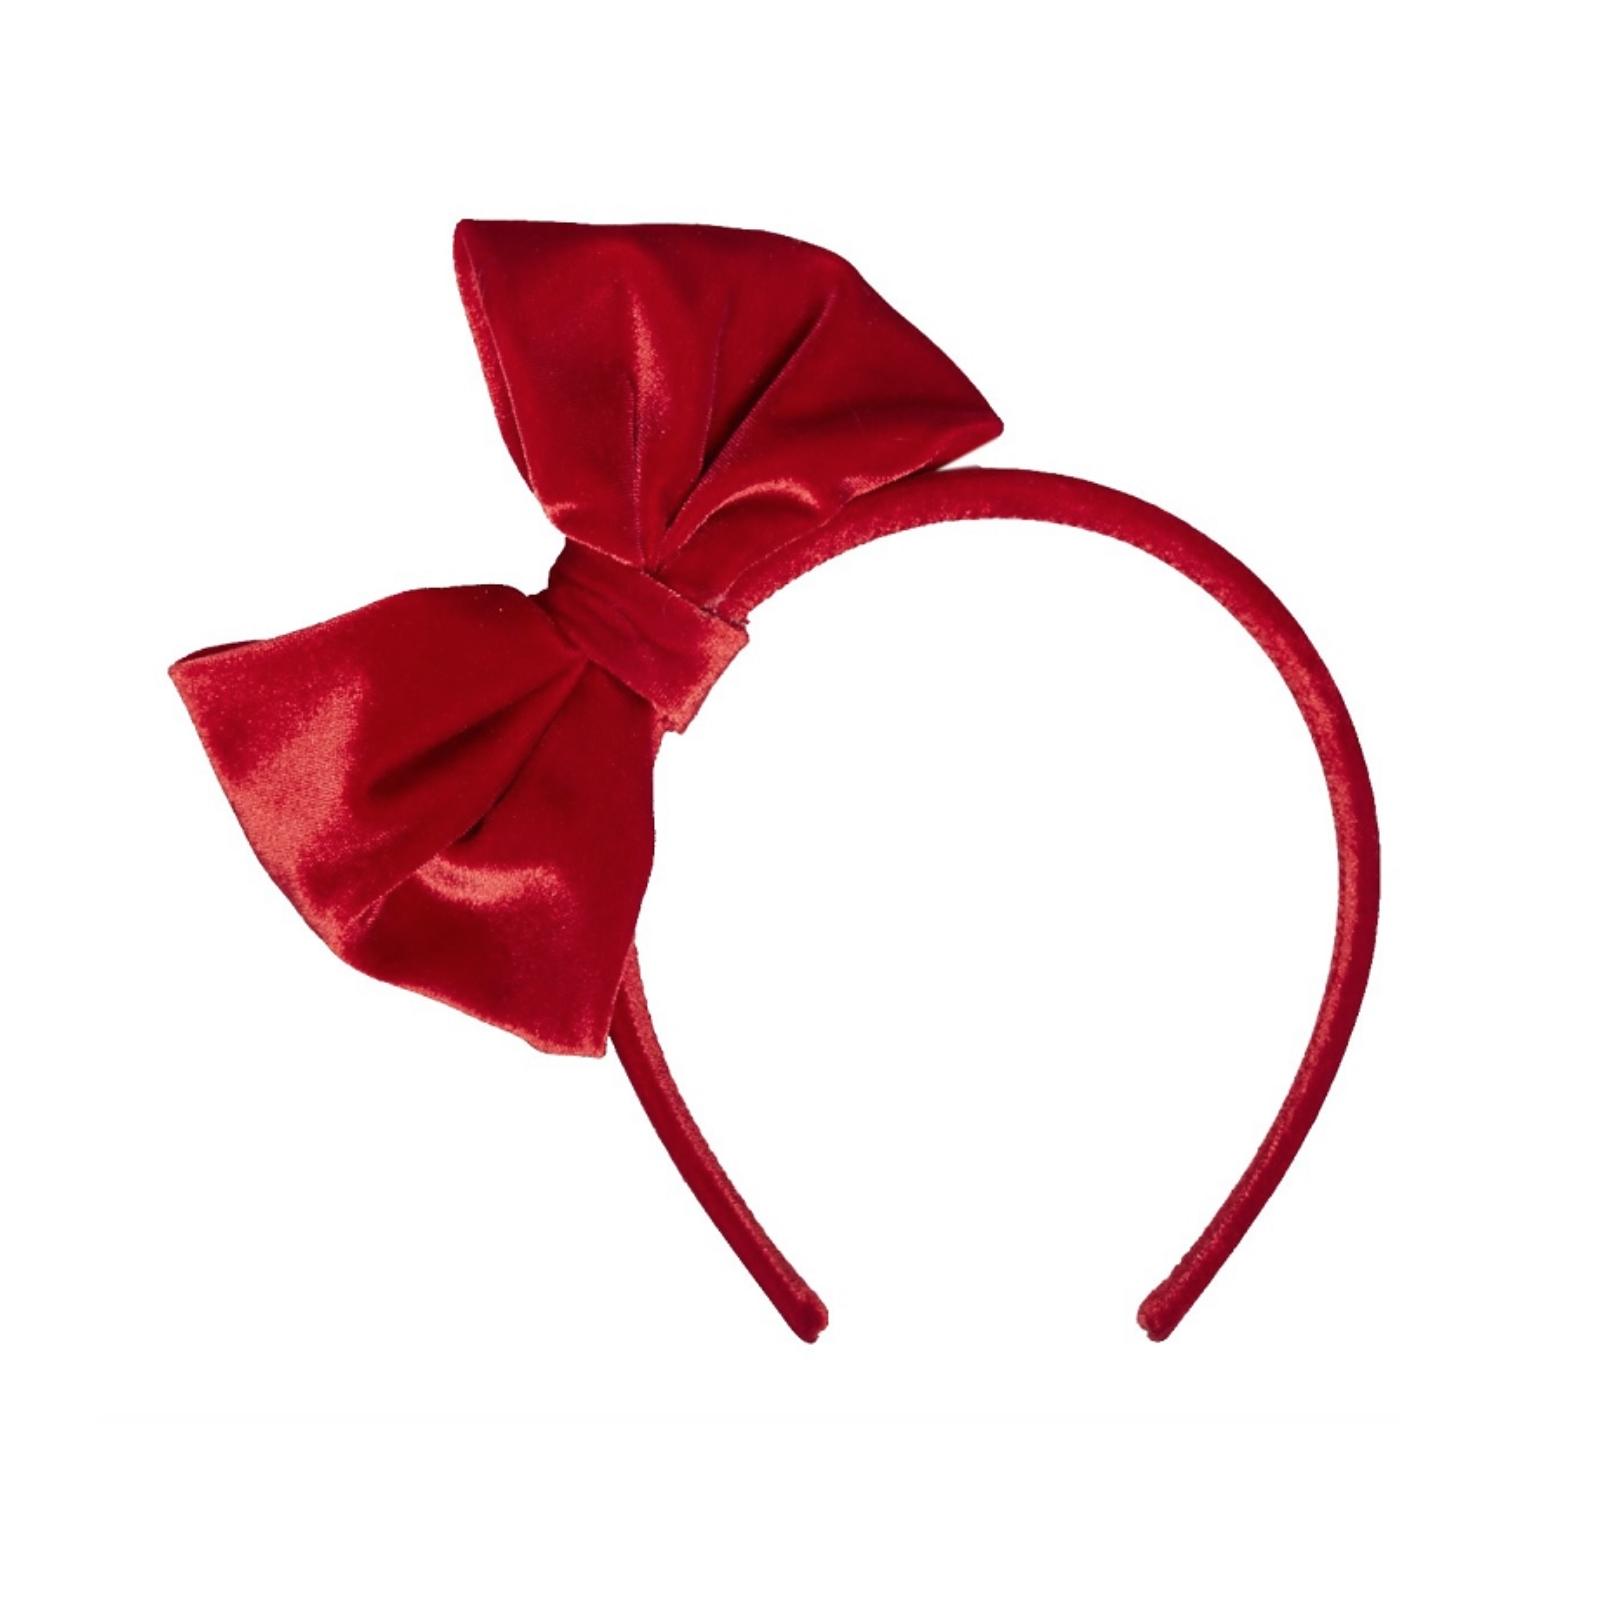 Headband With Ribbon Png & Free Headband With Ribbon.png Transparent.